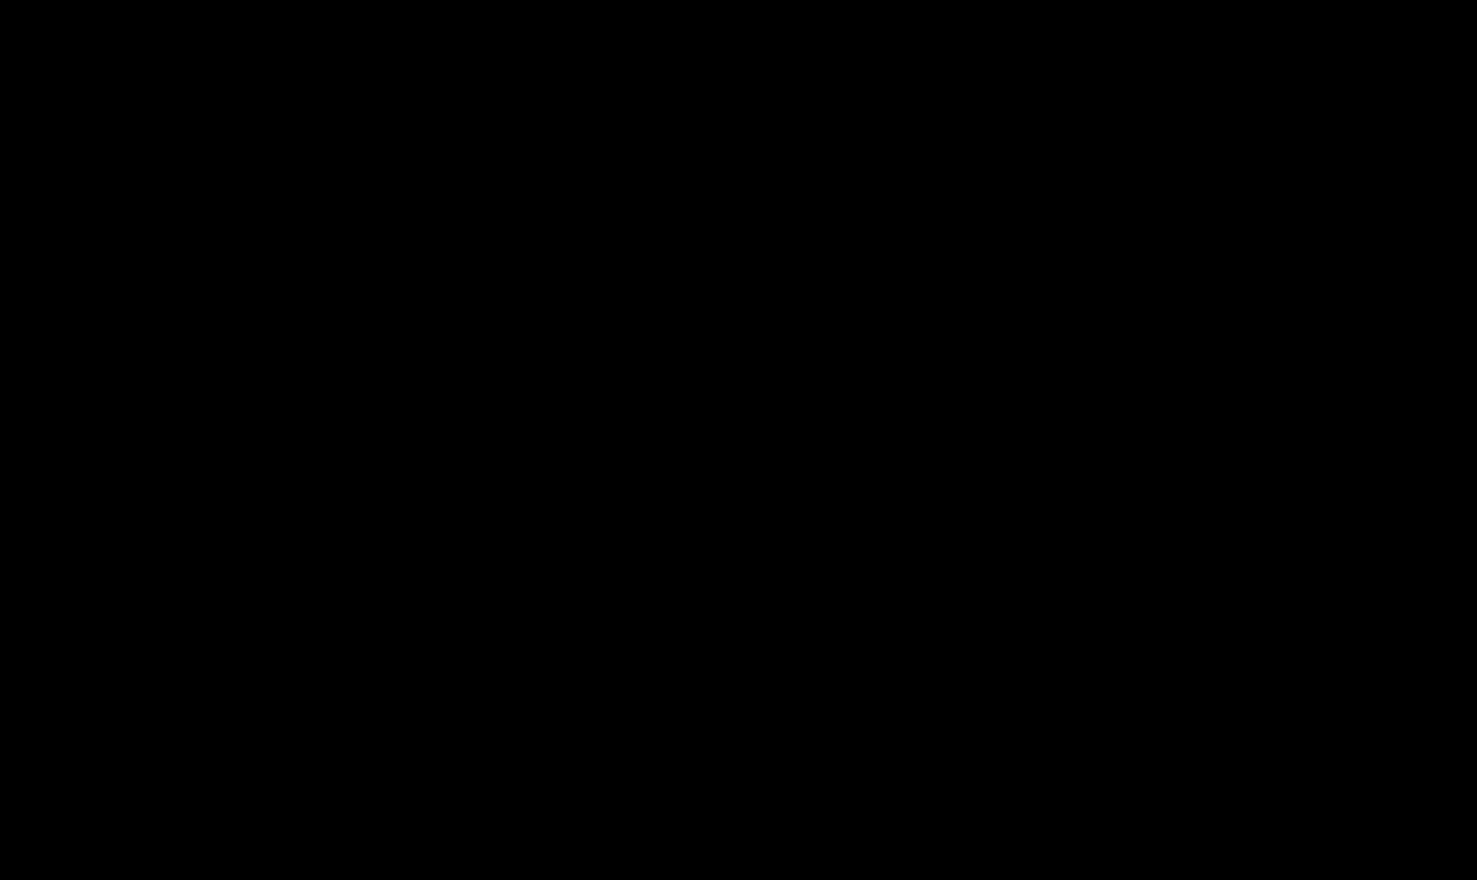 N-Arachidonoyltaurine